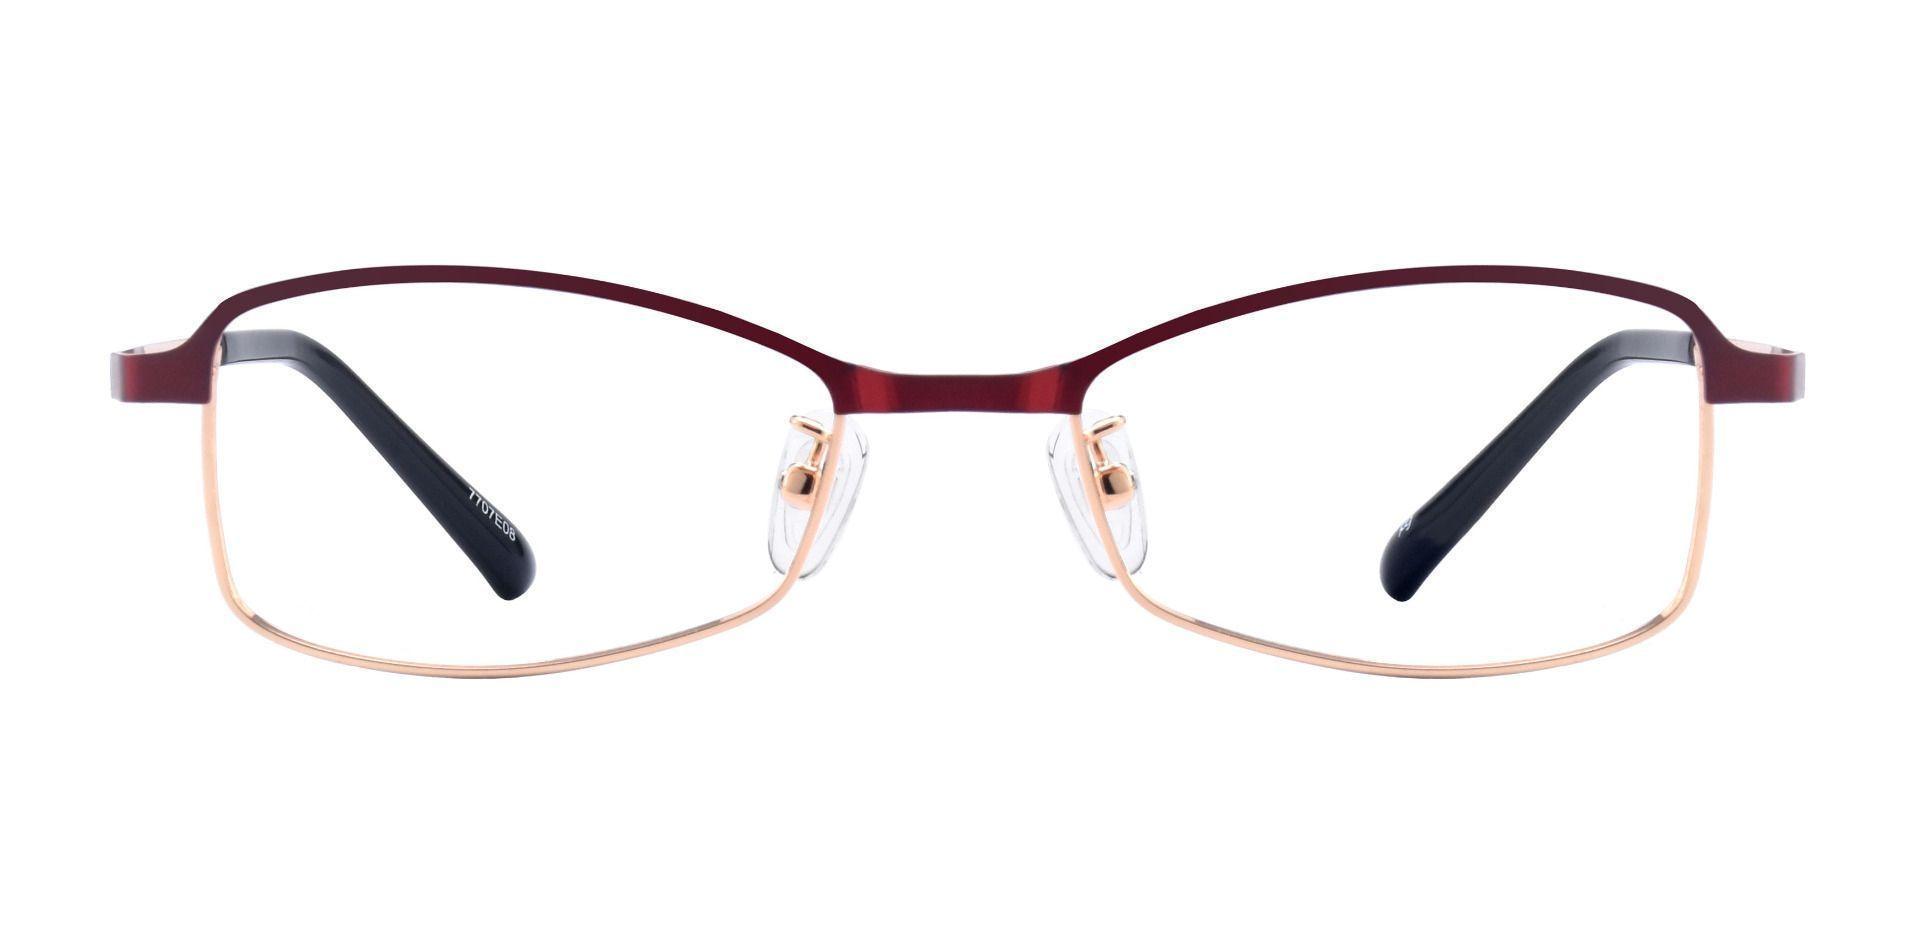 Shelby Rectangle Blue Light Blocking Glasses - Red